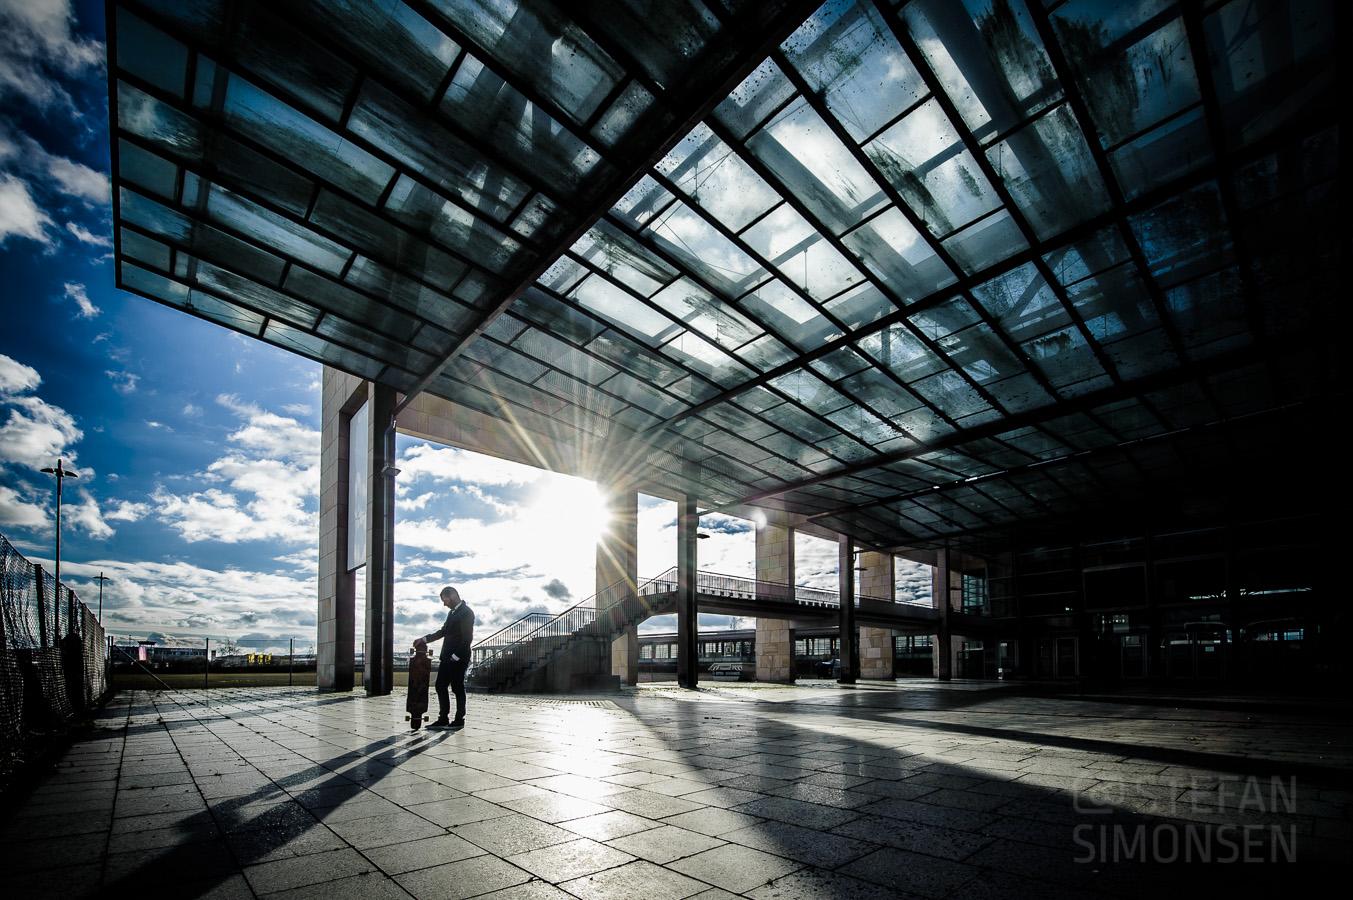 Portraitfoto mit Skateboard am Messebahnhof in Laatzen